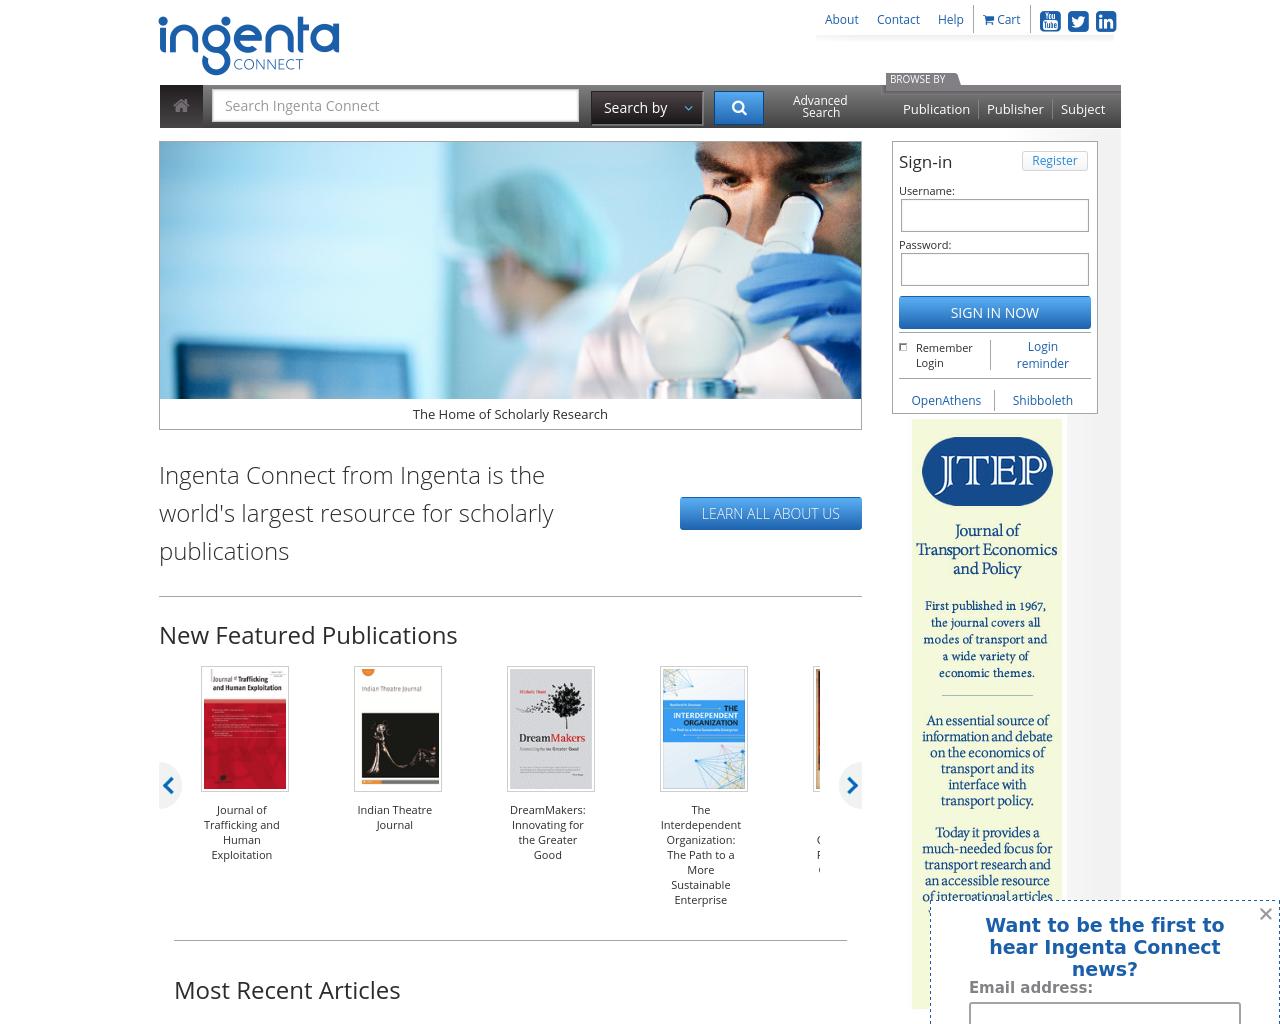 ingentaconnect-Advertising-Reviews-Pricing